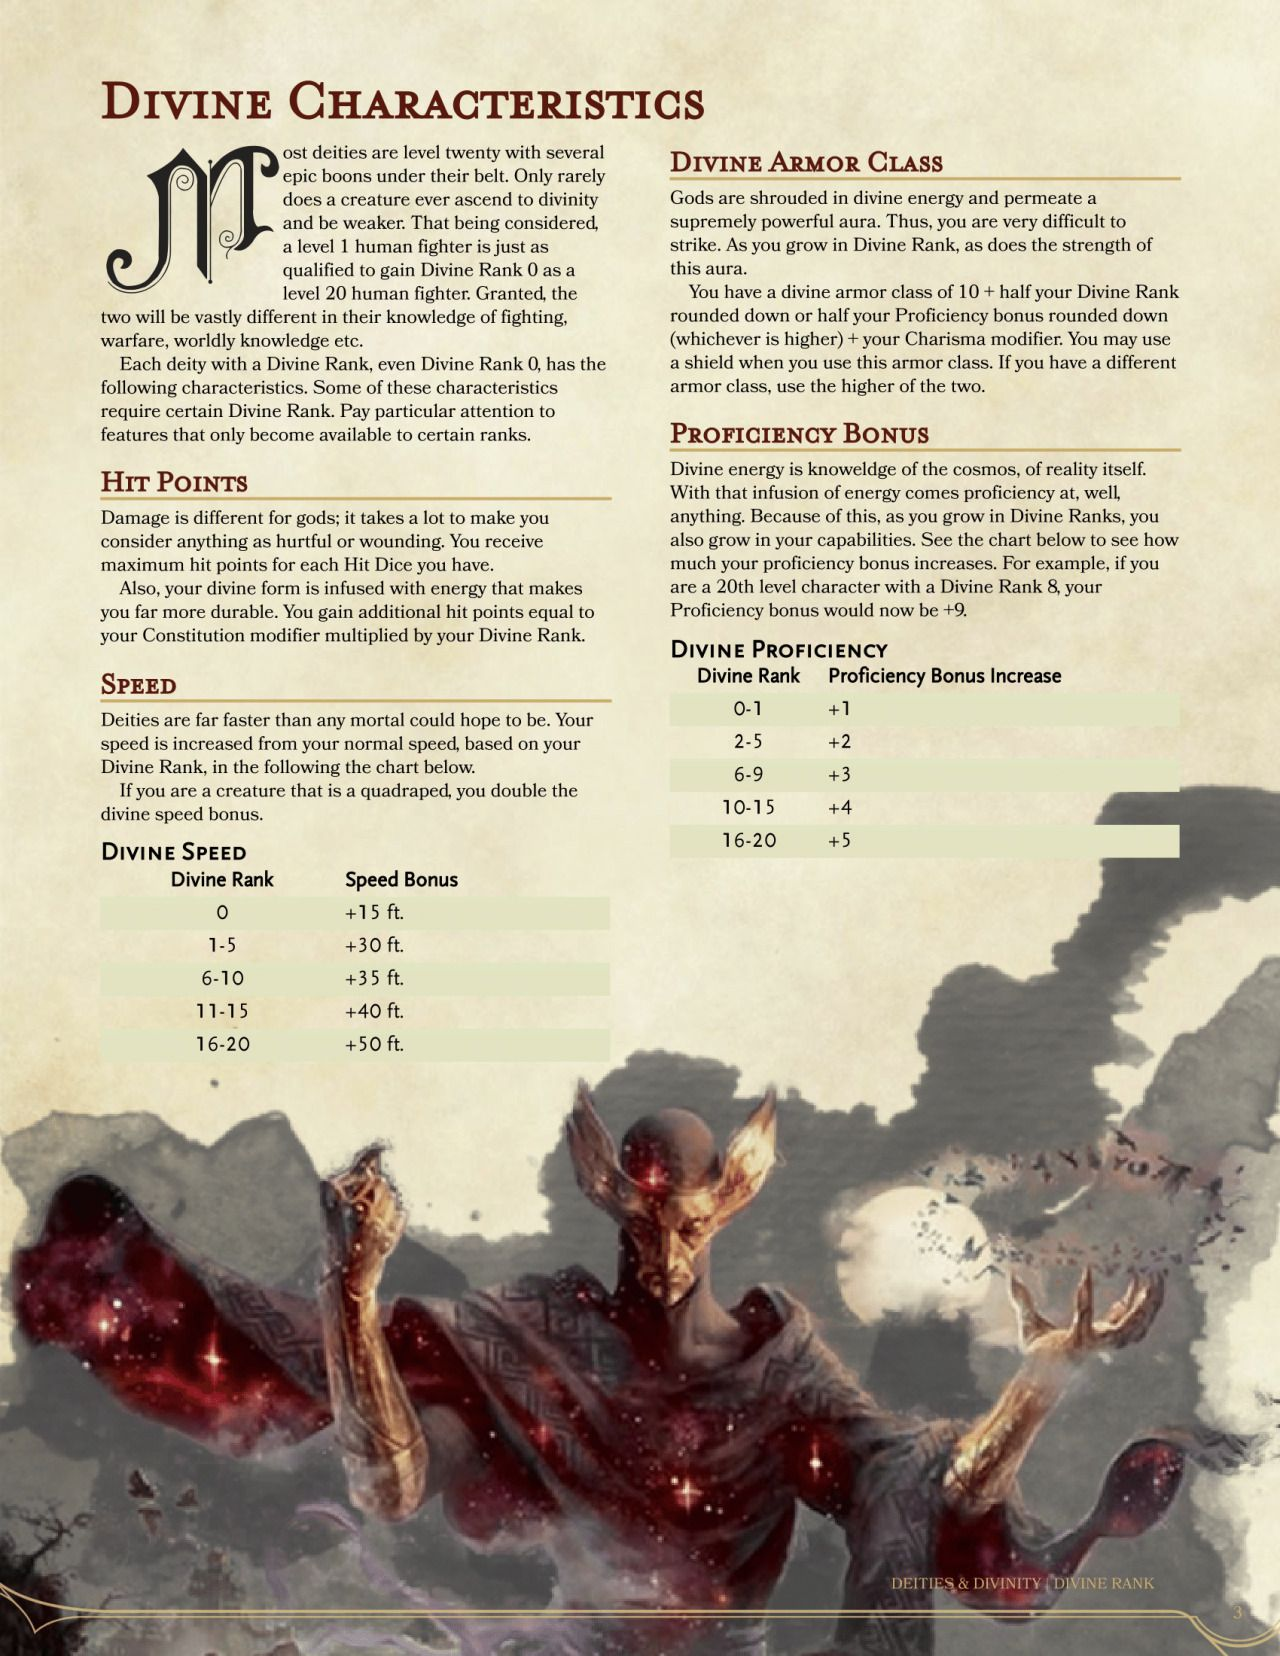 DnD 5e Homebrew | DnD monsters | Pinterest | Dnd 5e homebrew, RPG ...